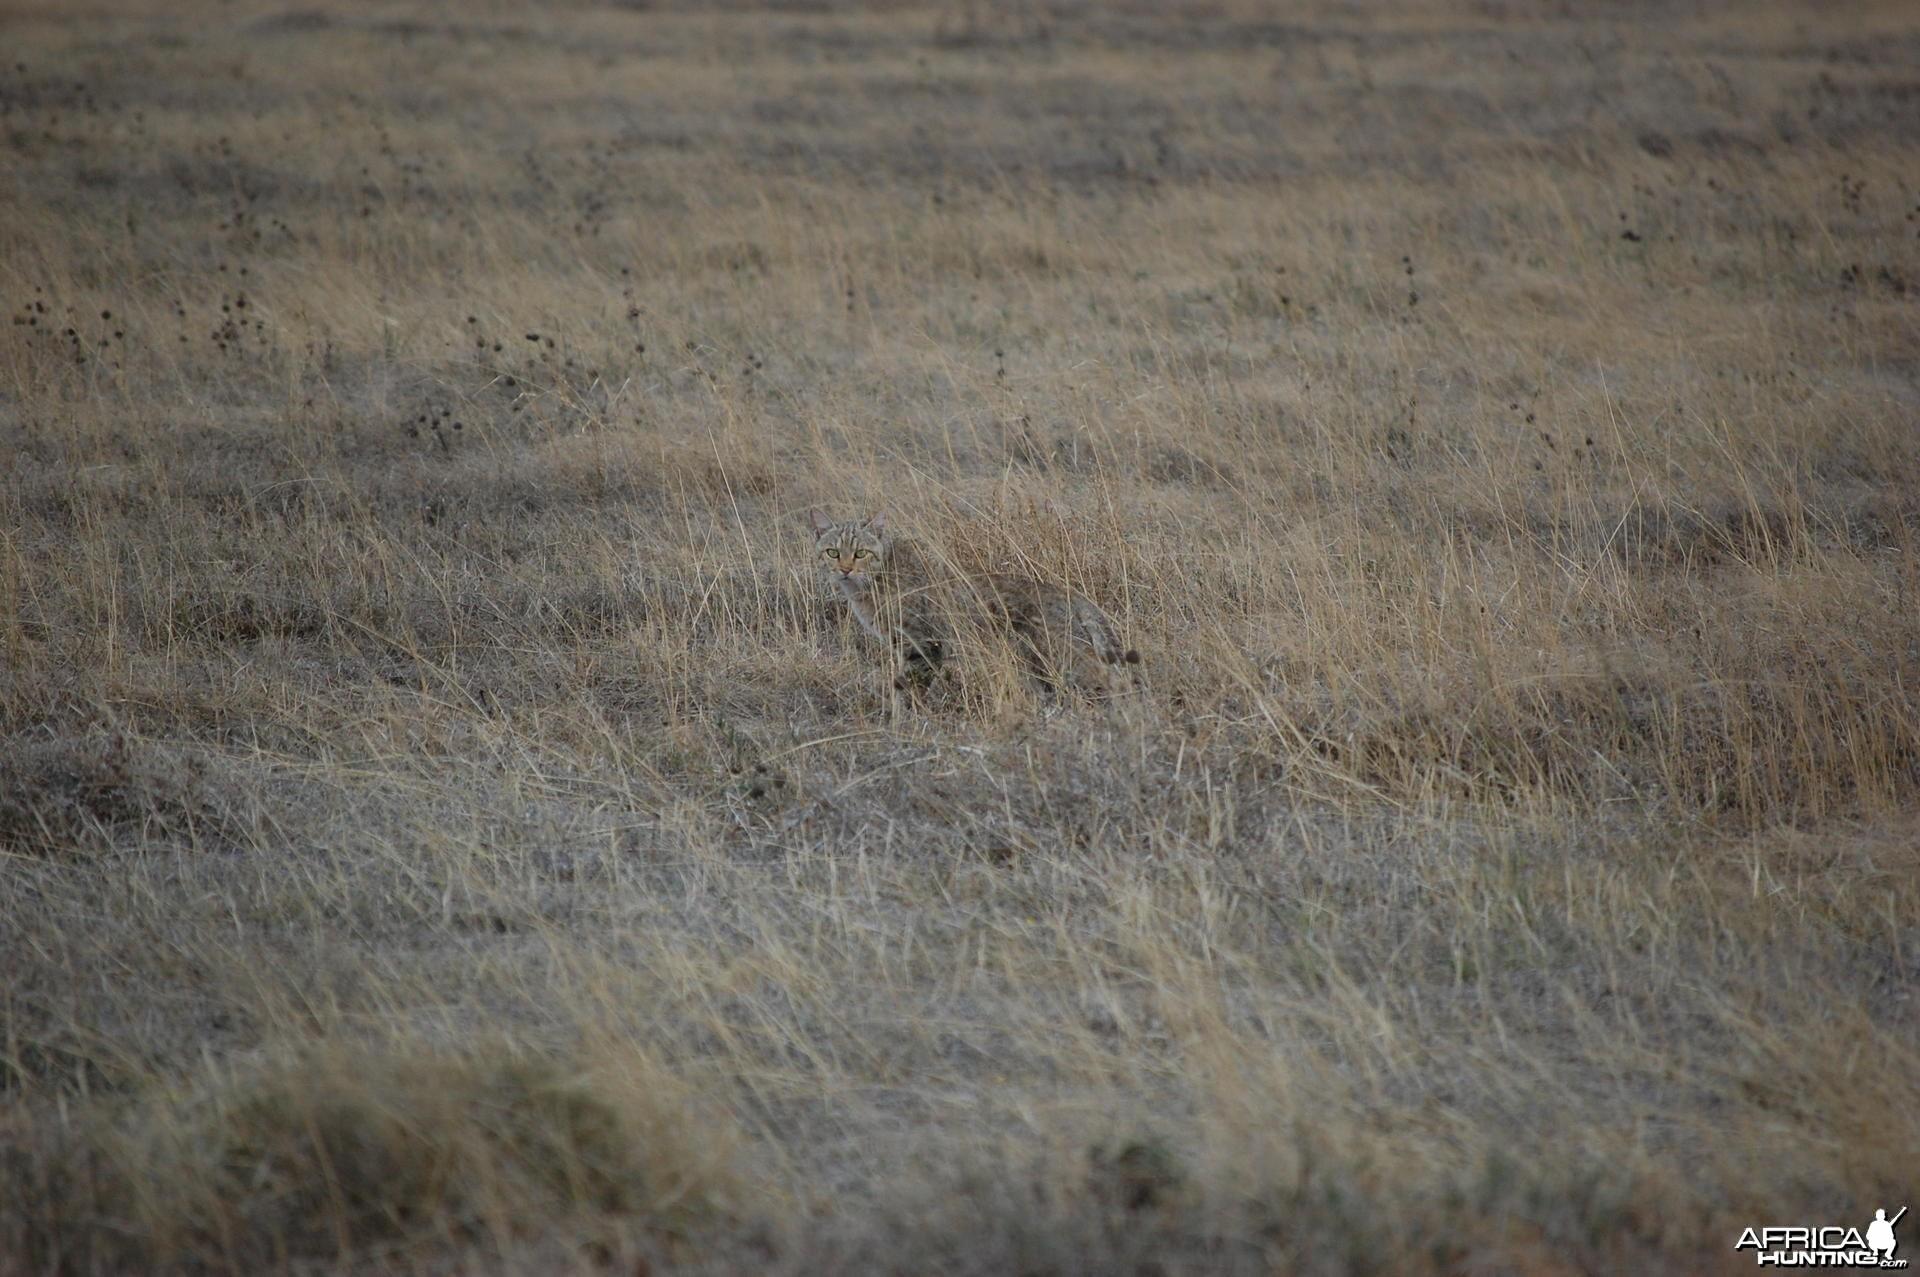 Wildcat Tanzania